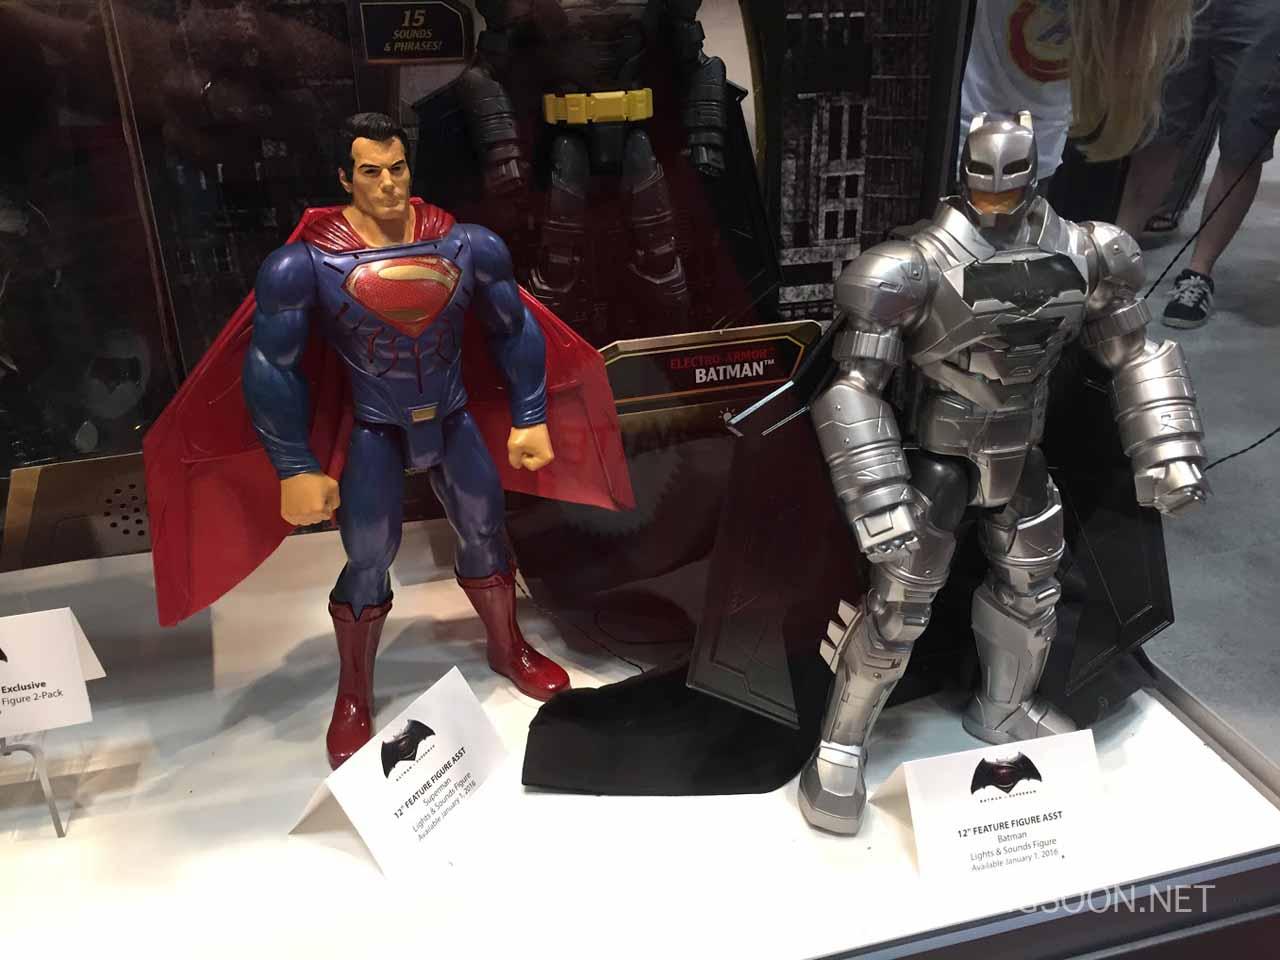 Batman v Superman: Dawn of Justice - I modellini di Batman e Superman